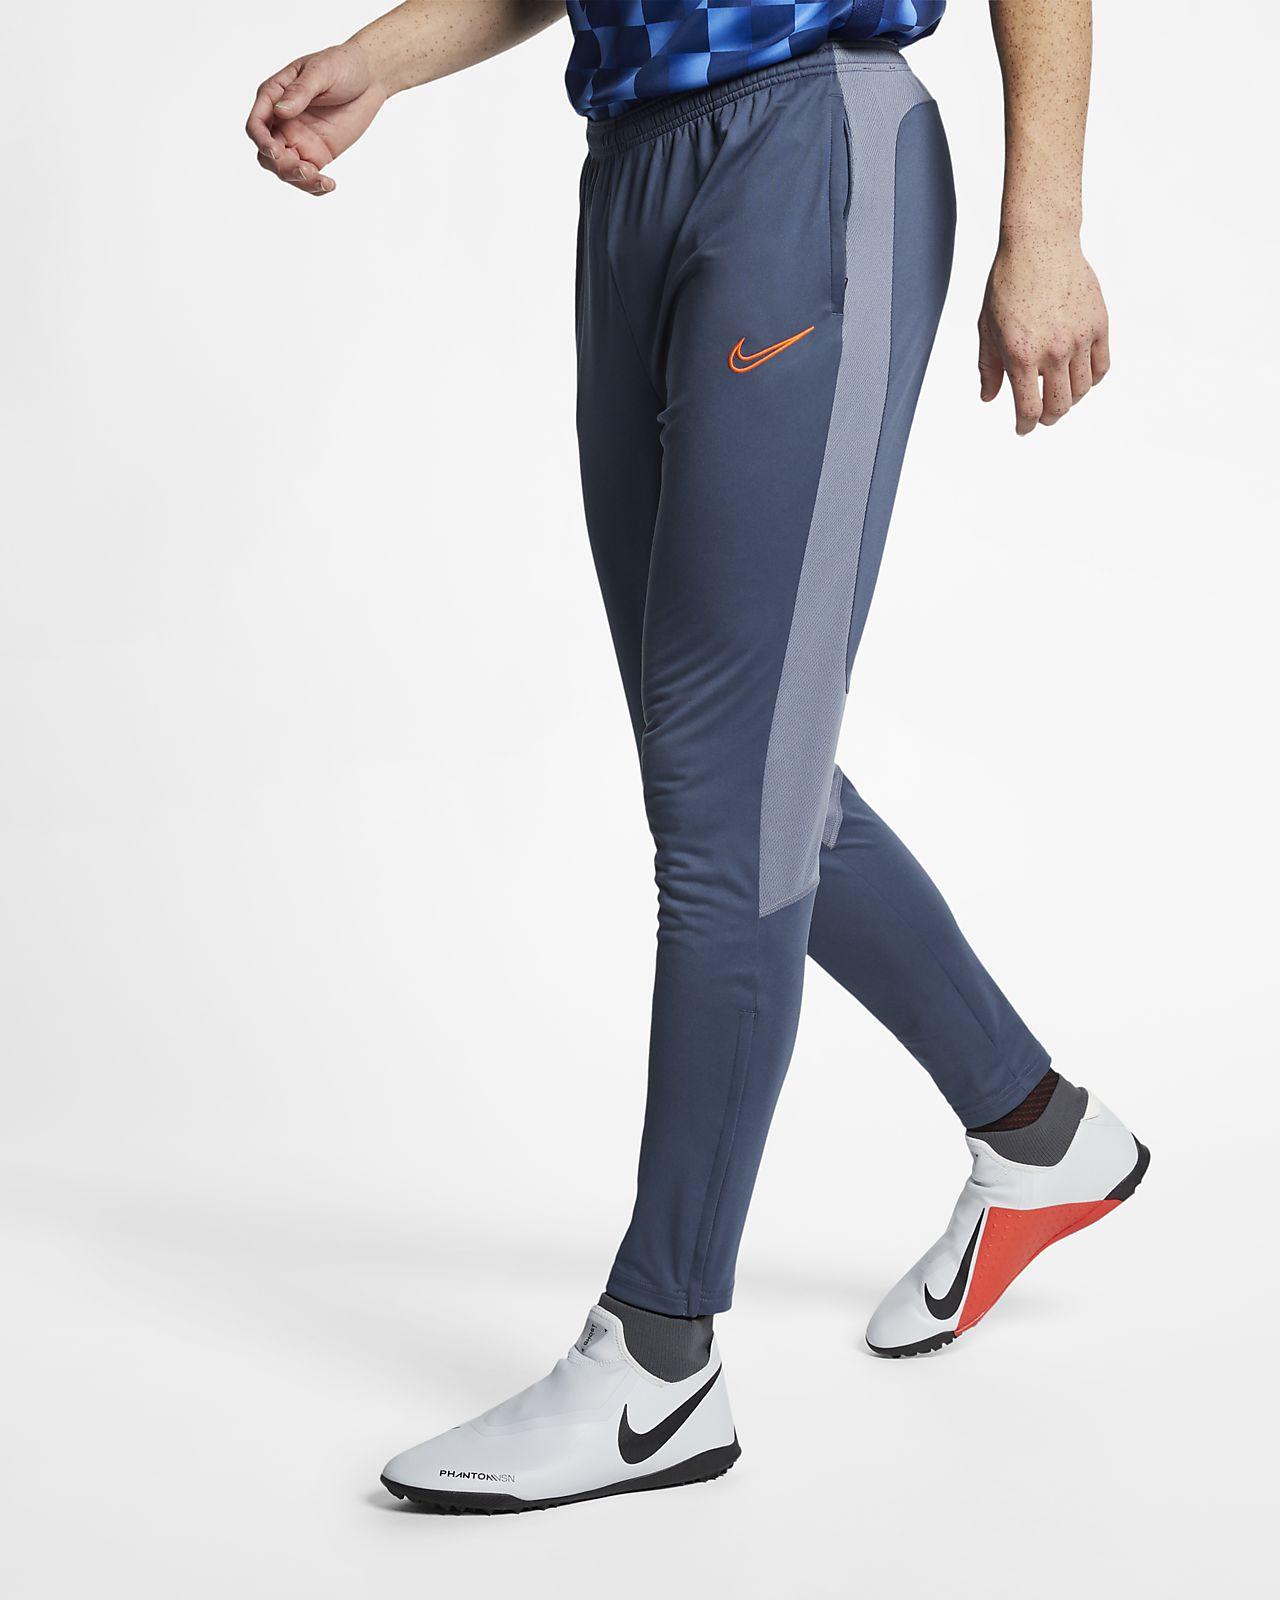 b11f8974 Мужские футбольные брюки Nike Dri-FIT Academy. Nike.com RU